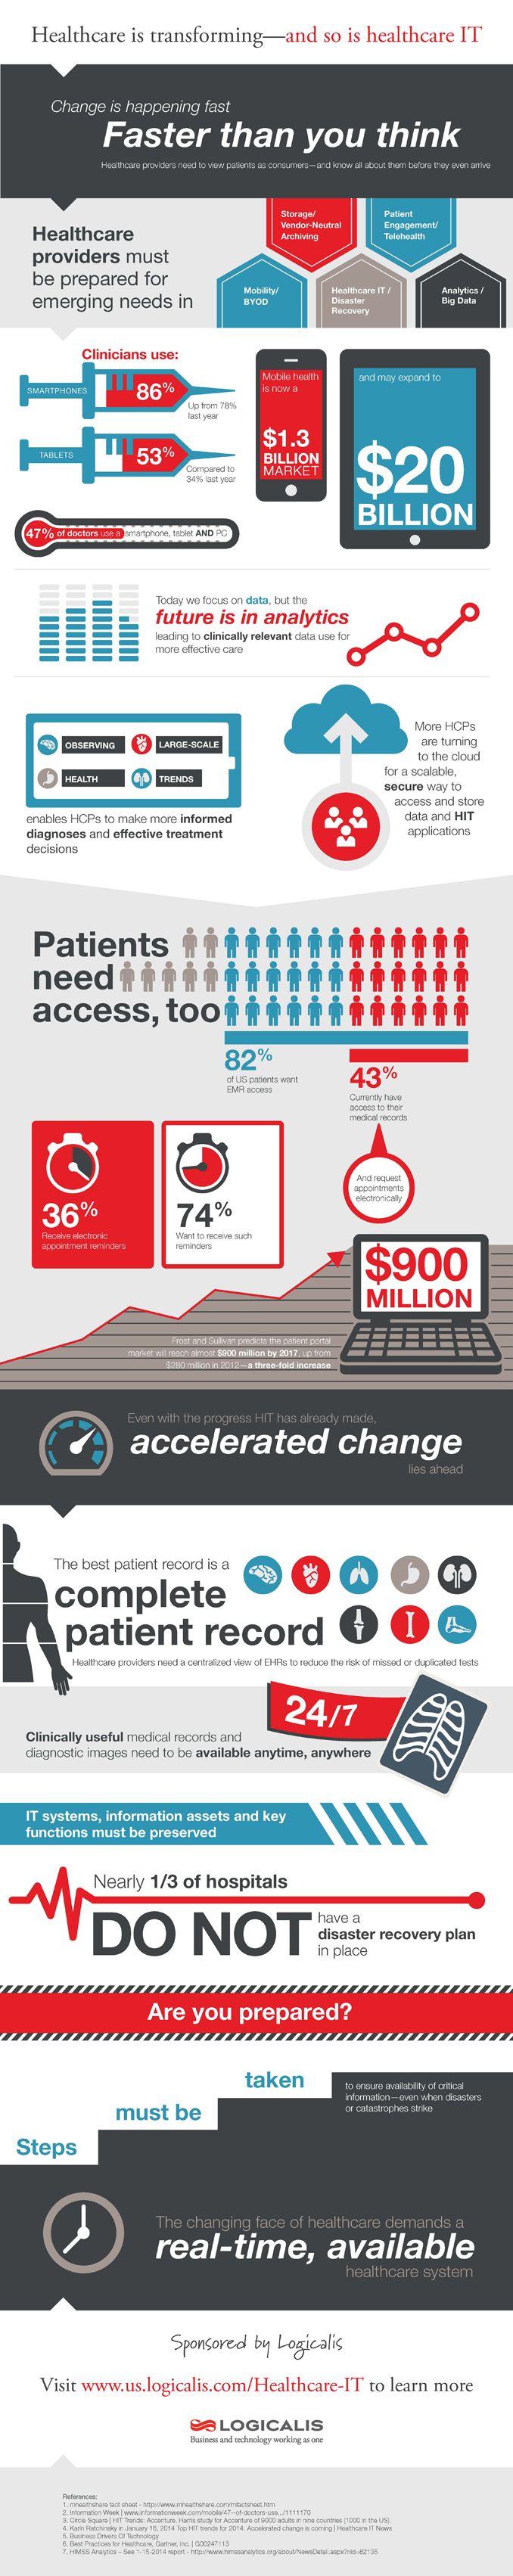 healthcare-infographic-aug2014-sm